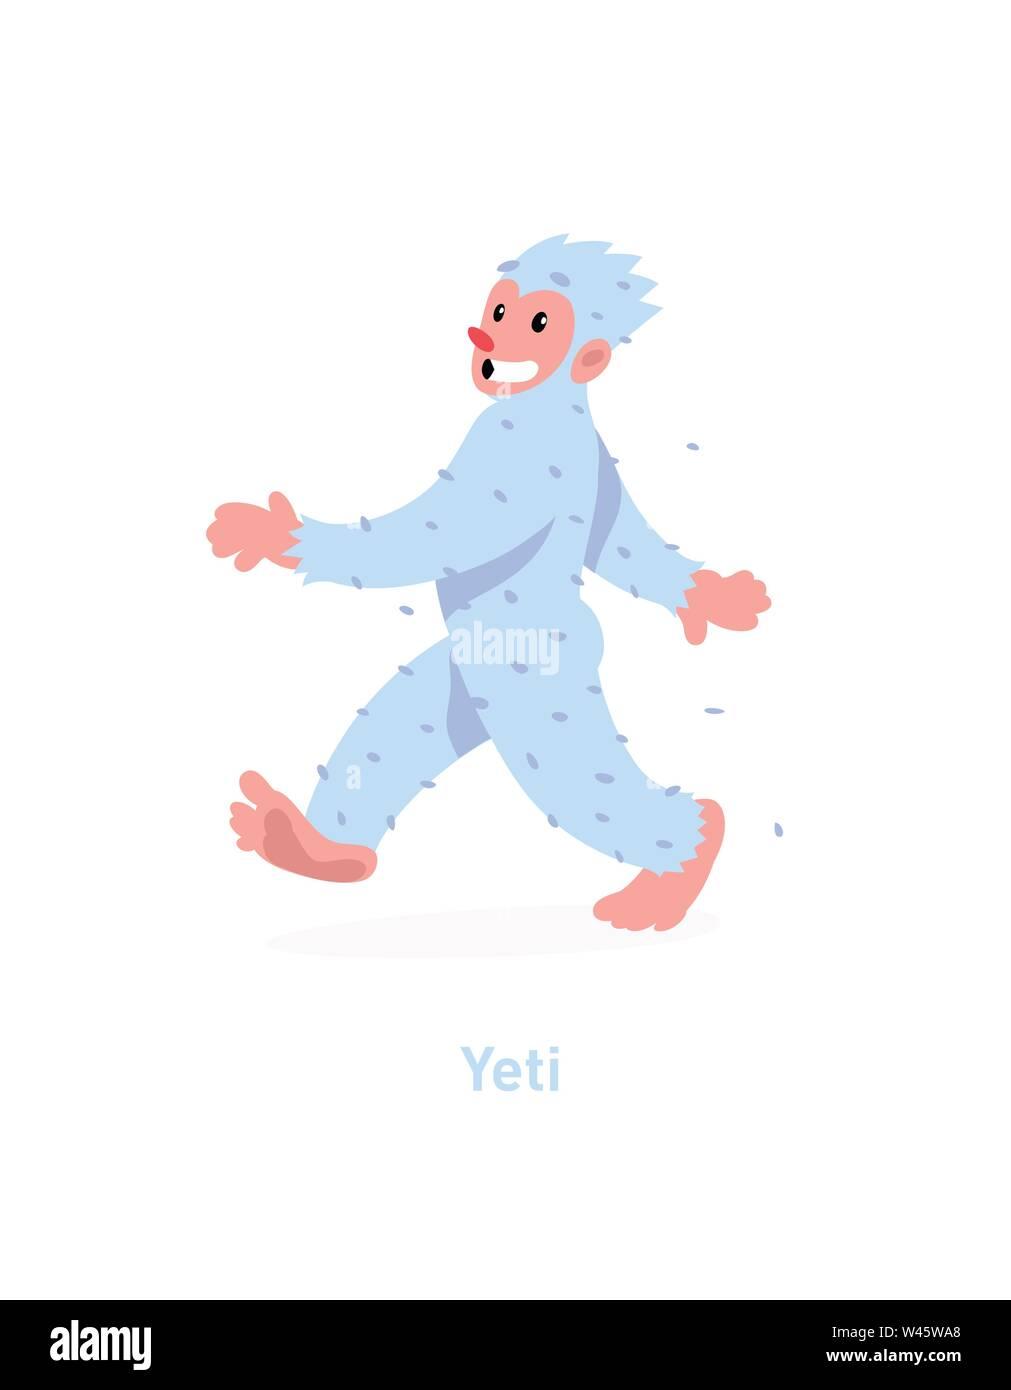 An illustration of a cartoon Yeti. Vector illustration. A walking white yeti is coming. Image is isolated on white background. Flat fashion illustrati - Stock Image